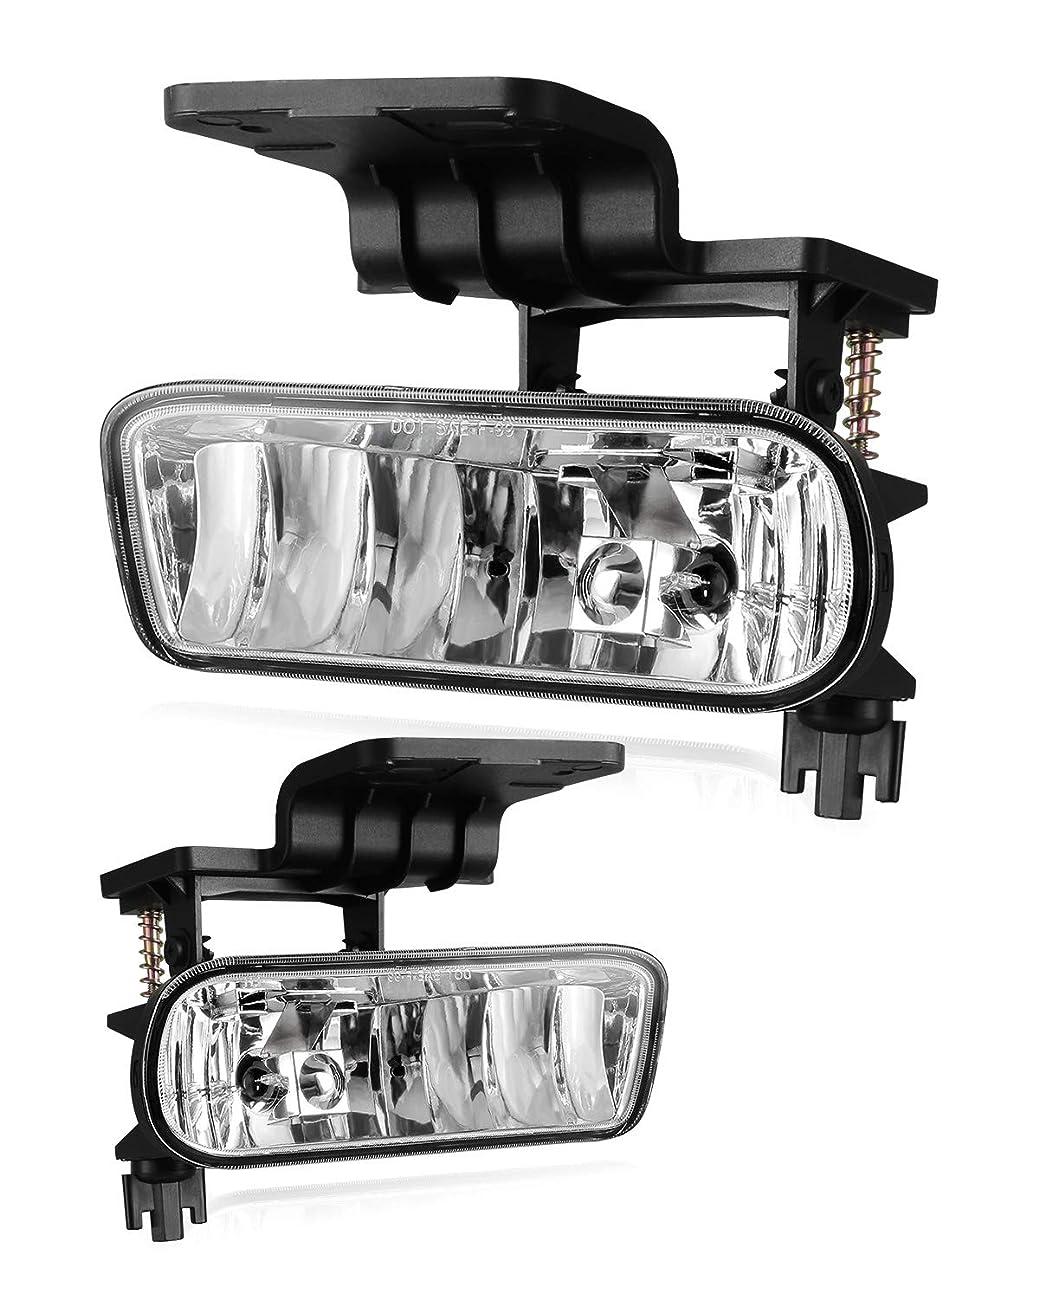 AUTOFREE OEM Fog Lights for Chevy 99-02 Silverado 1500 & 2500 | 00-01 Silverado 3500 | 00-06 Suburban | 00-06 Tahoe, 1 Pair with bulbs 899 12V37.5W (Clear lens)